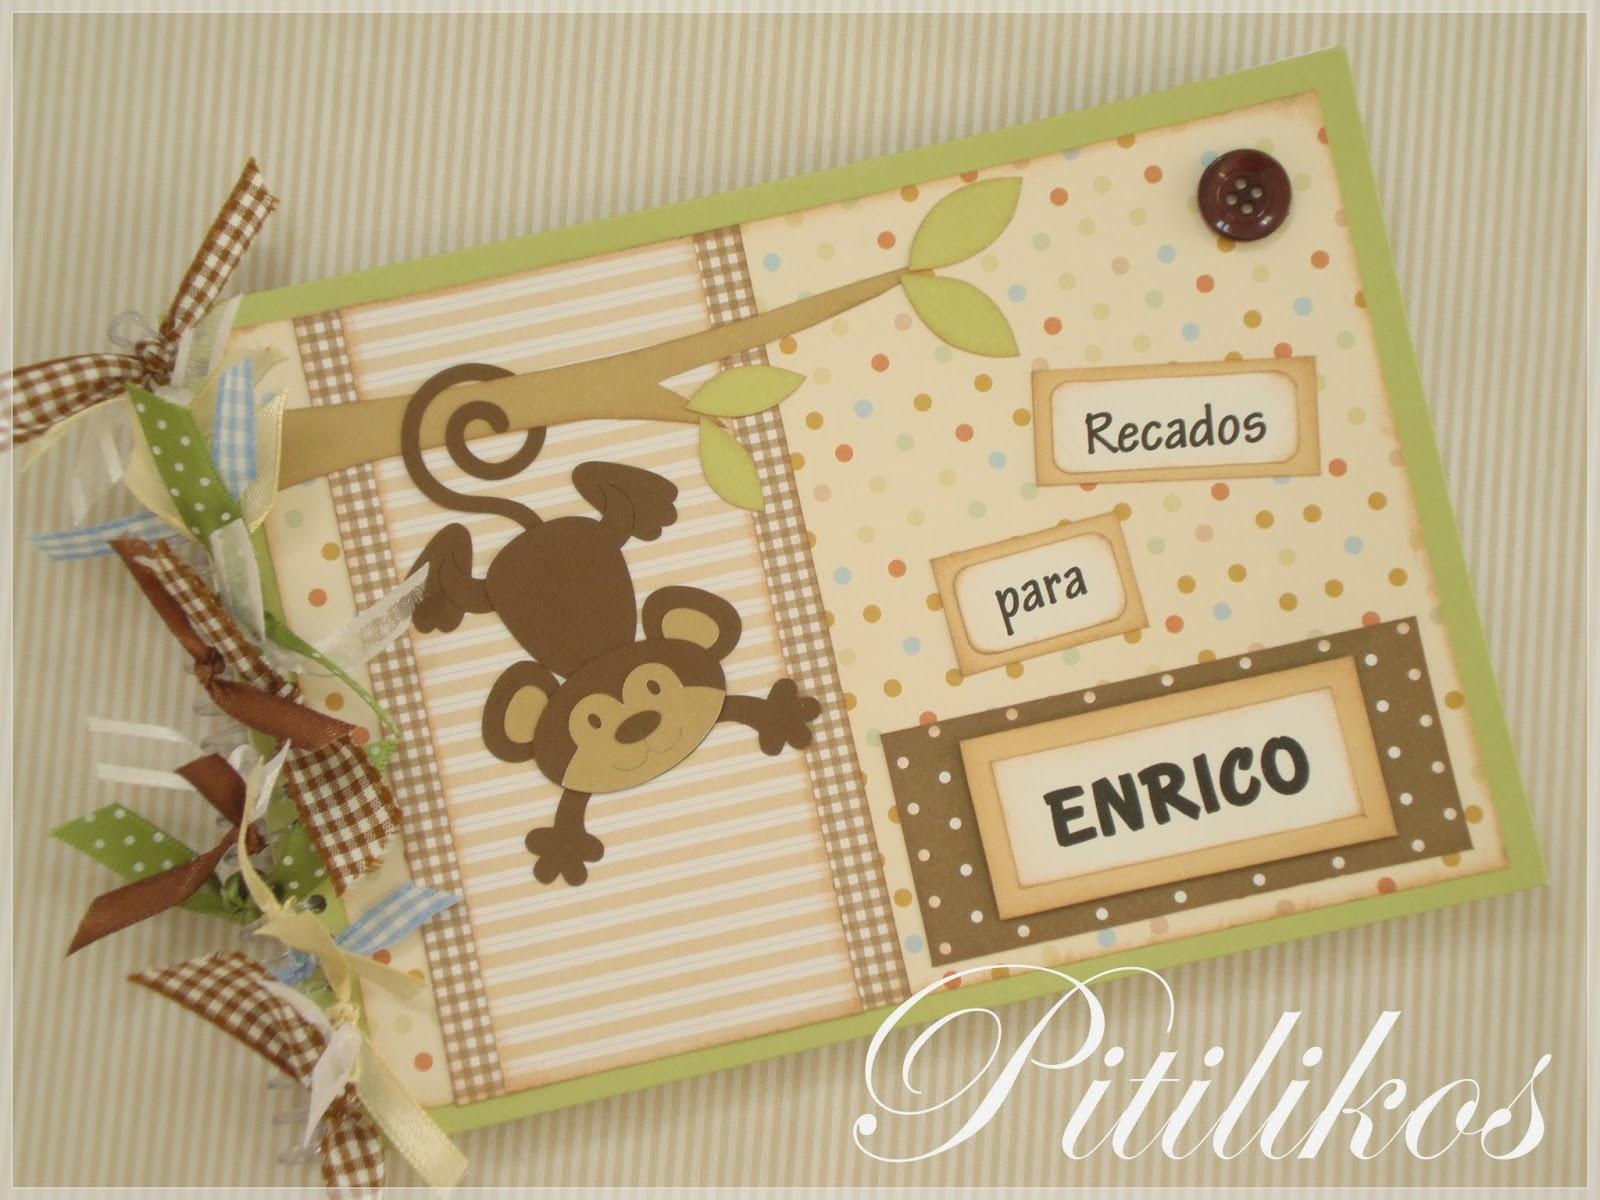 http://www.pitilikos.com.br/scrap-caderninho-recados-safari.html